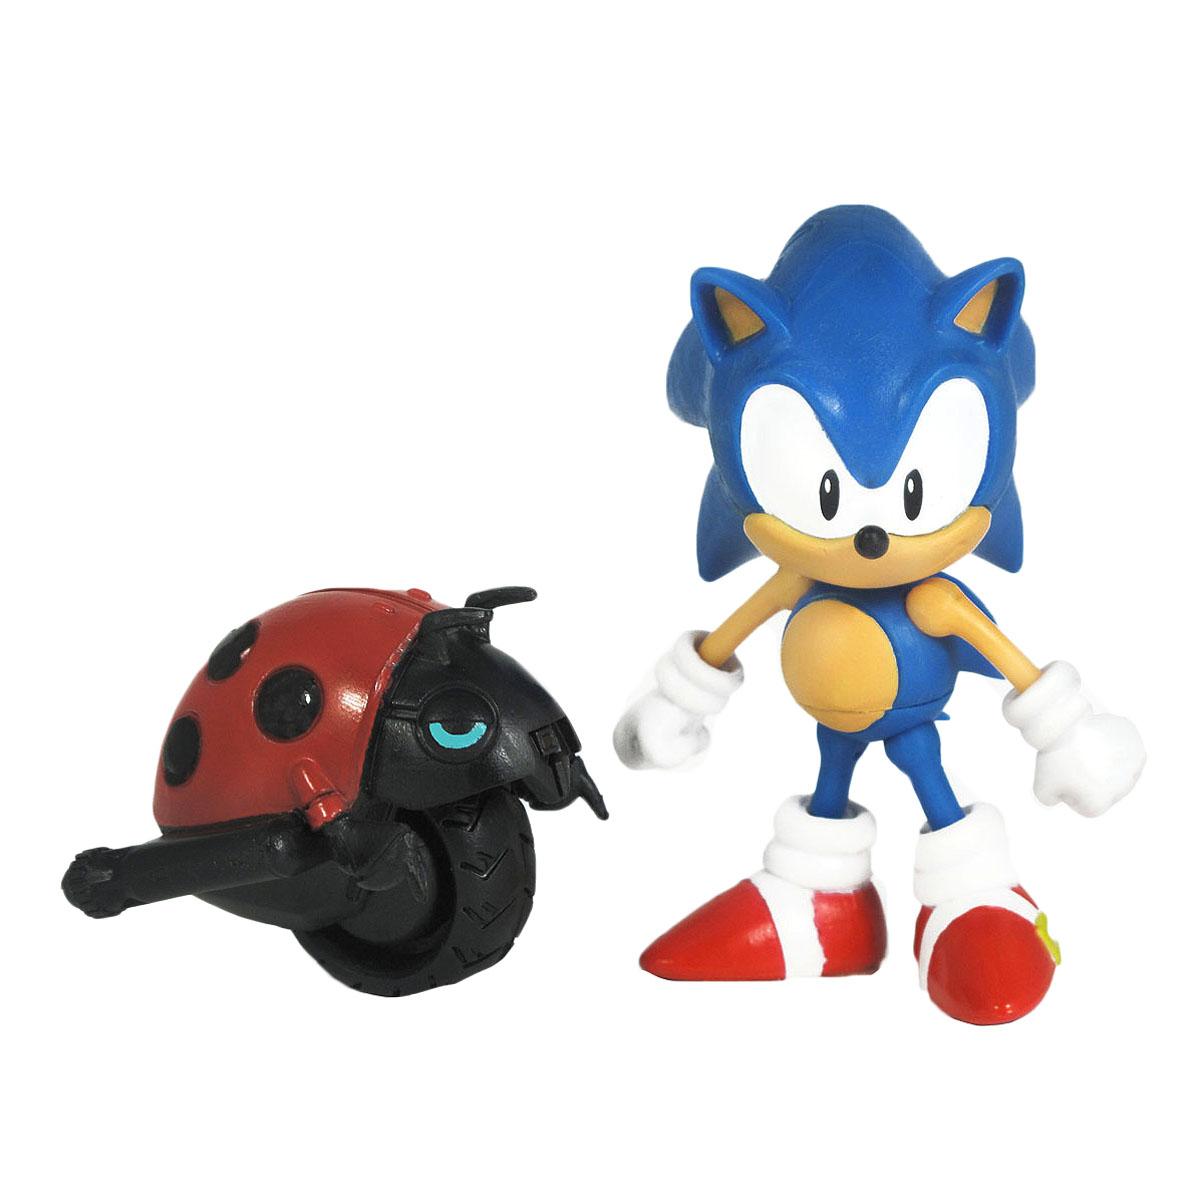 "Фигурка Sonic ""Sonic & Moto Bag"", с божьей коровкой"